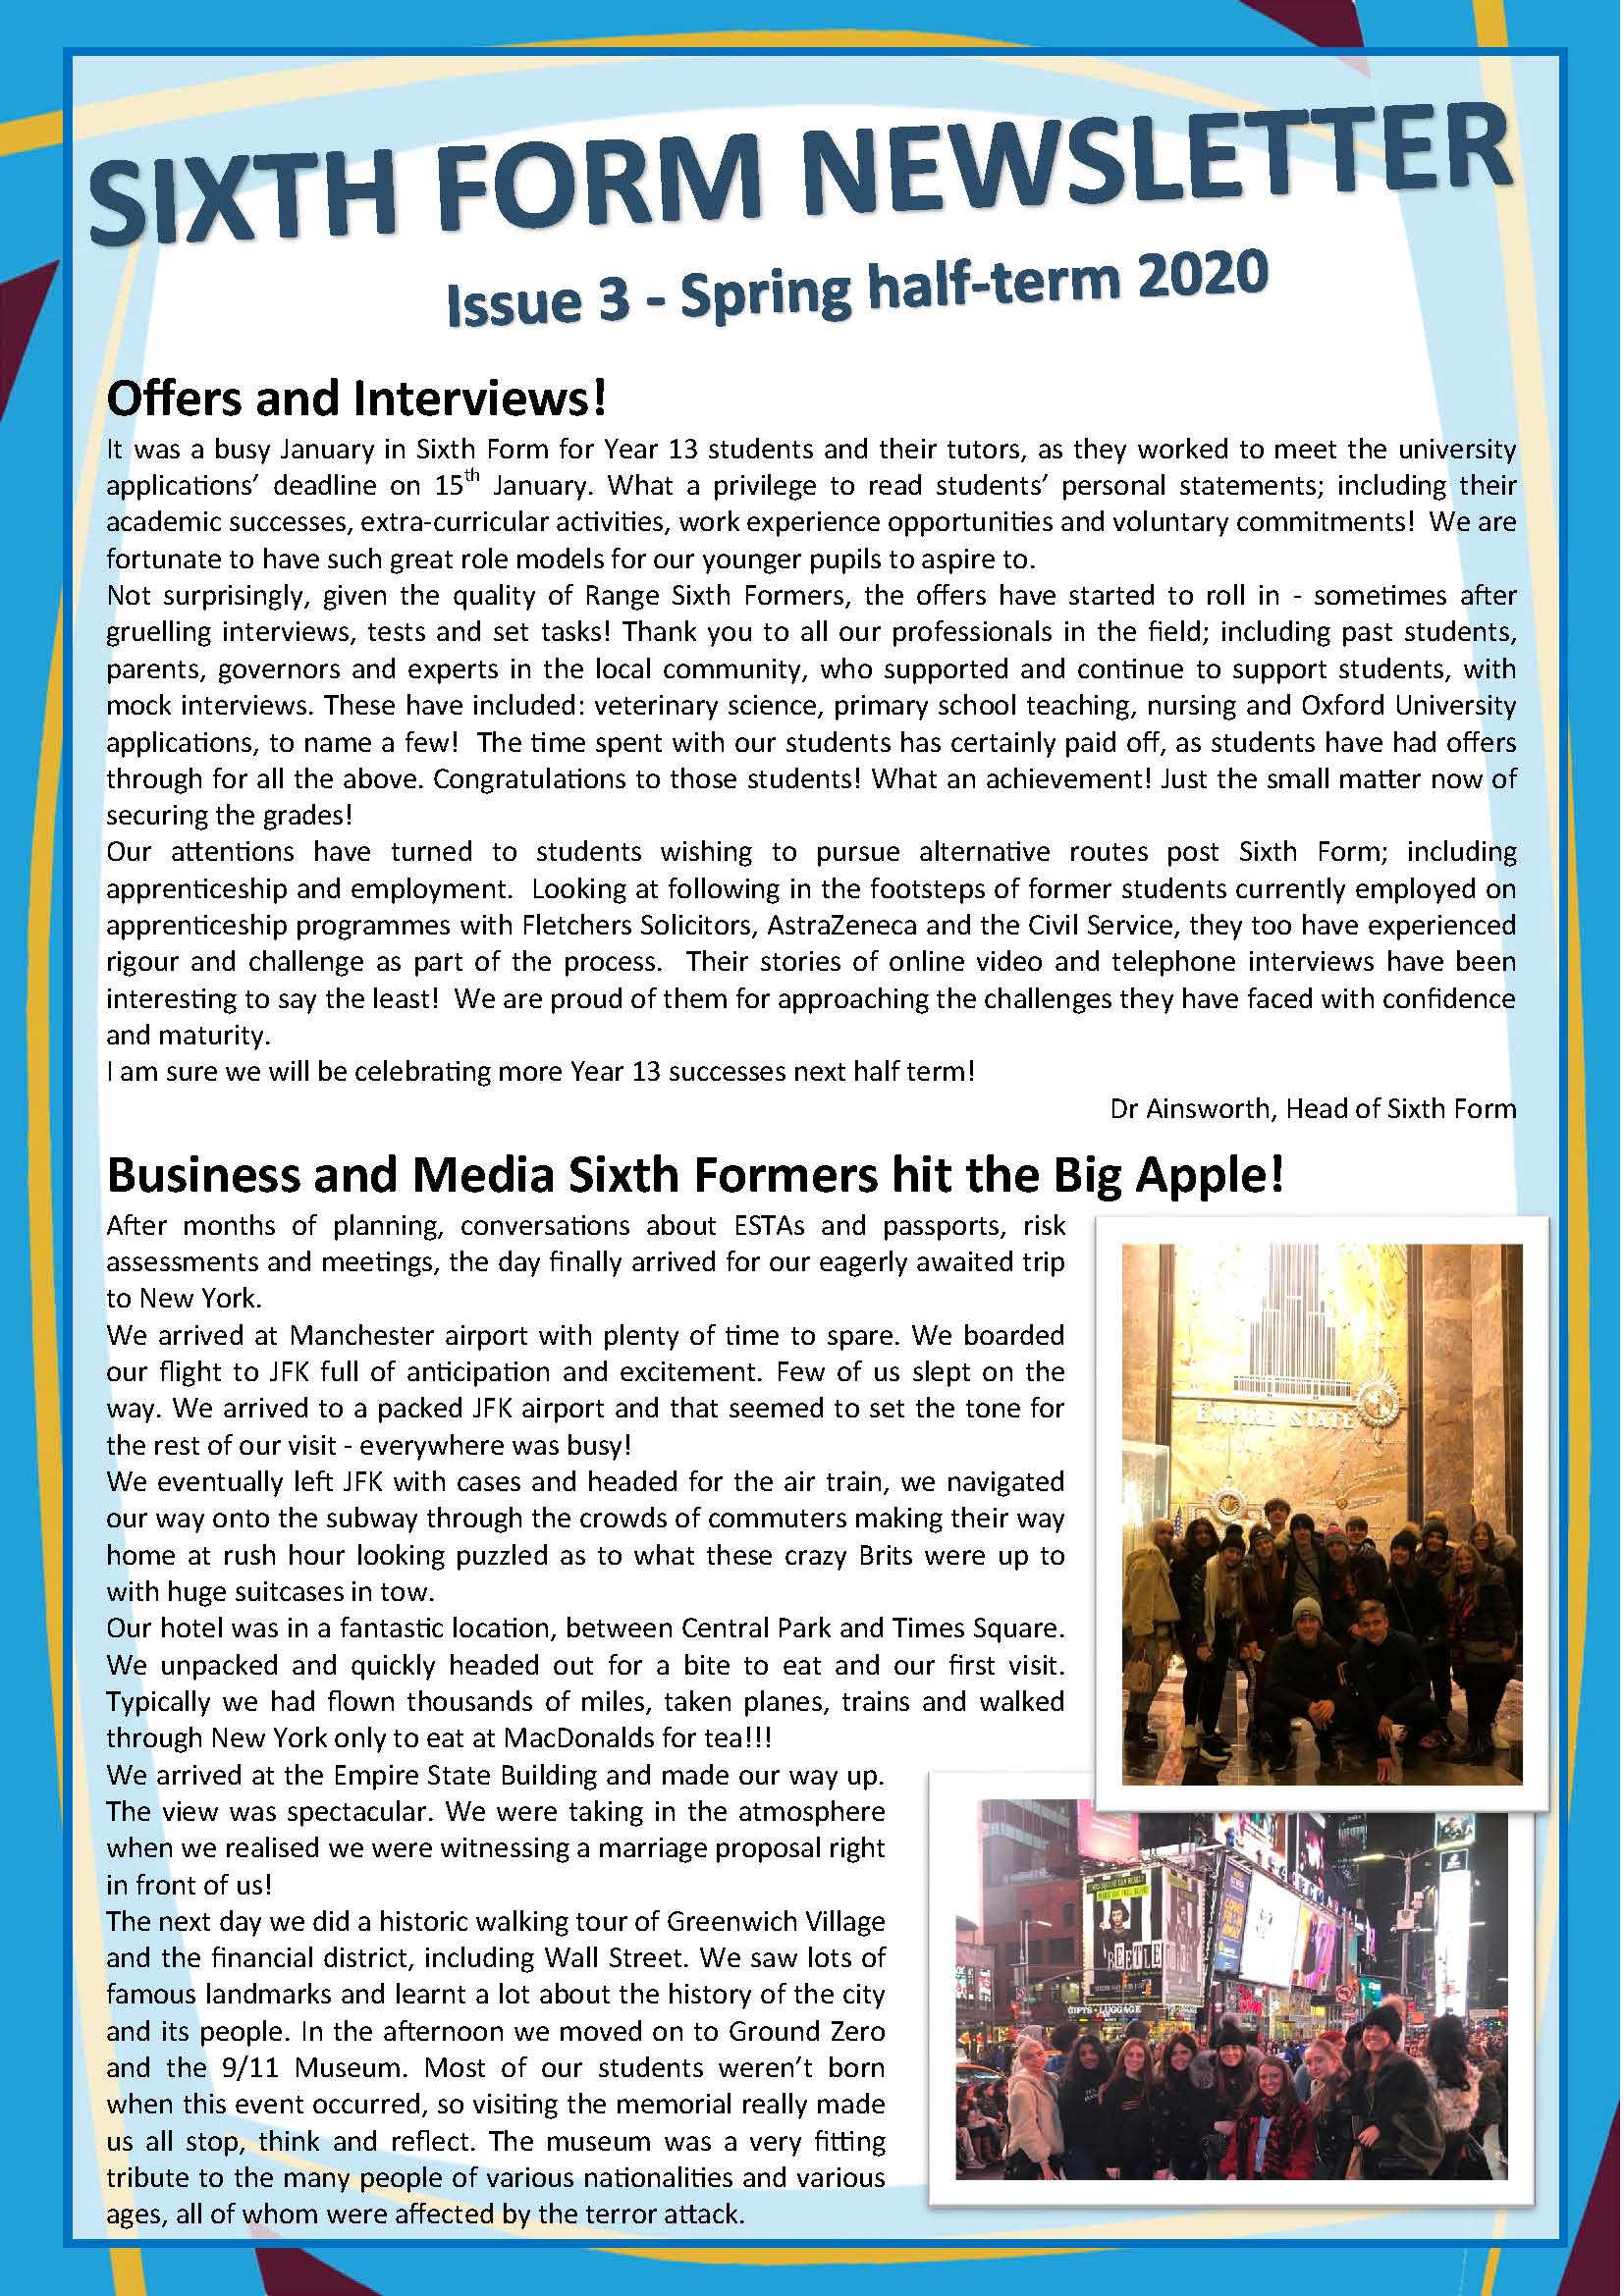 http://www.range.sefton.sch.uk/wp-content/uploads/2020/02/Newsletter_Page_11.jpg